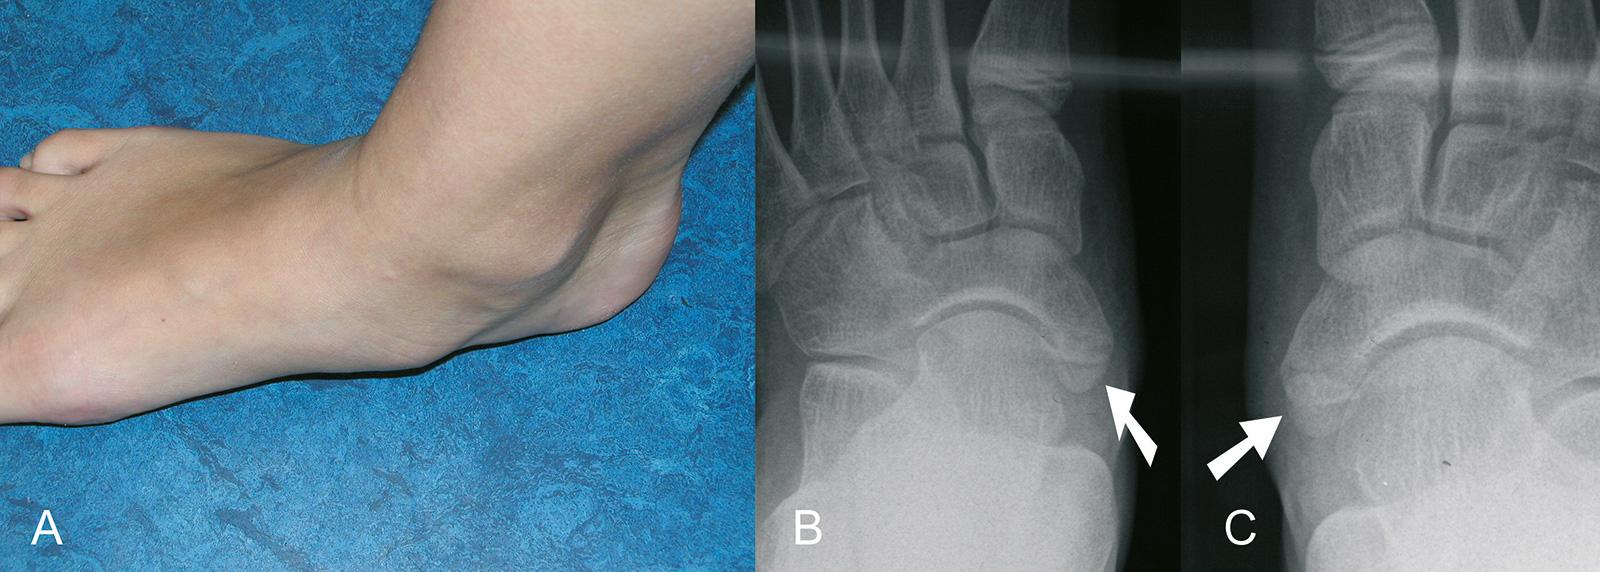 Abb. 4-64: Beidseitiges Os tibiale externum: Klinik (A) und Röntgenbild (B-C)